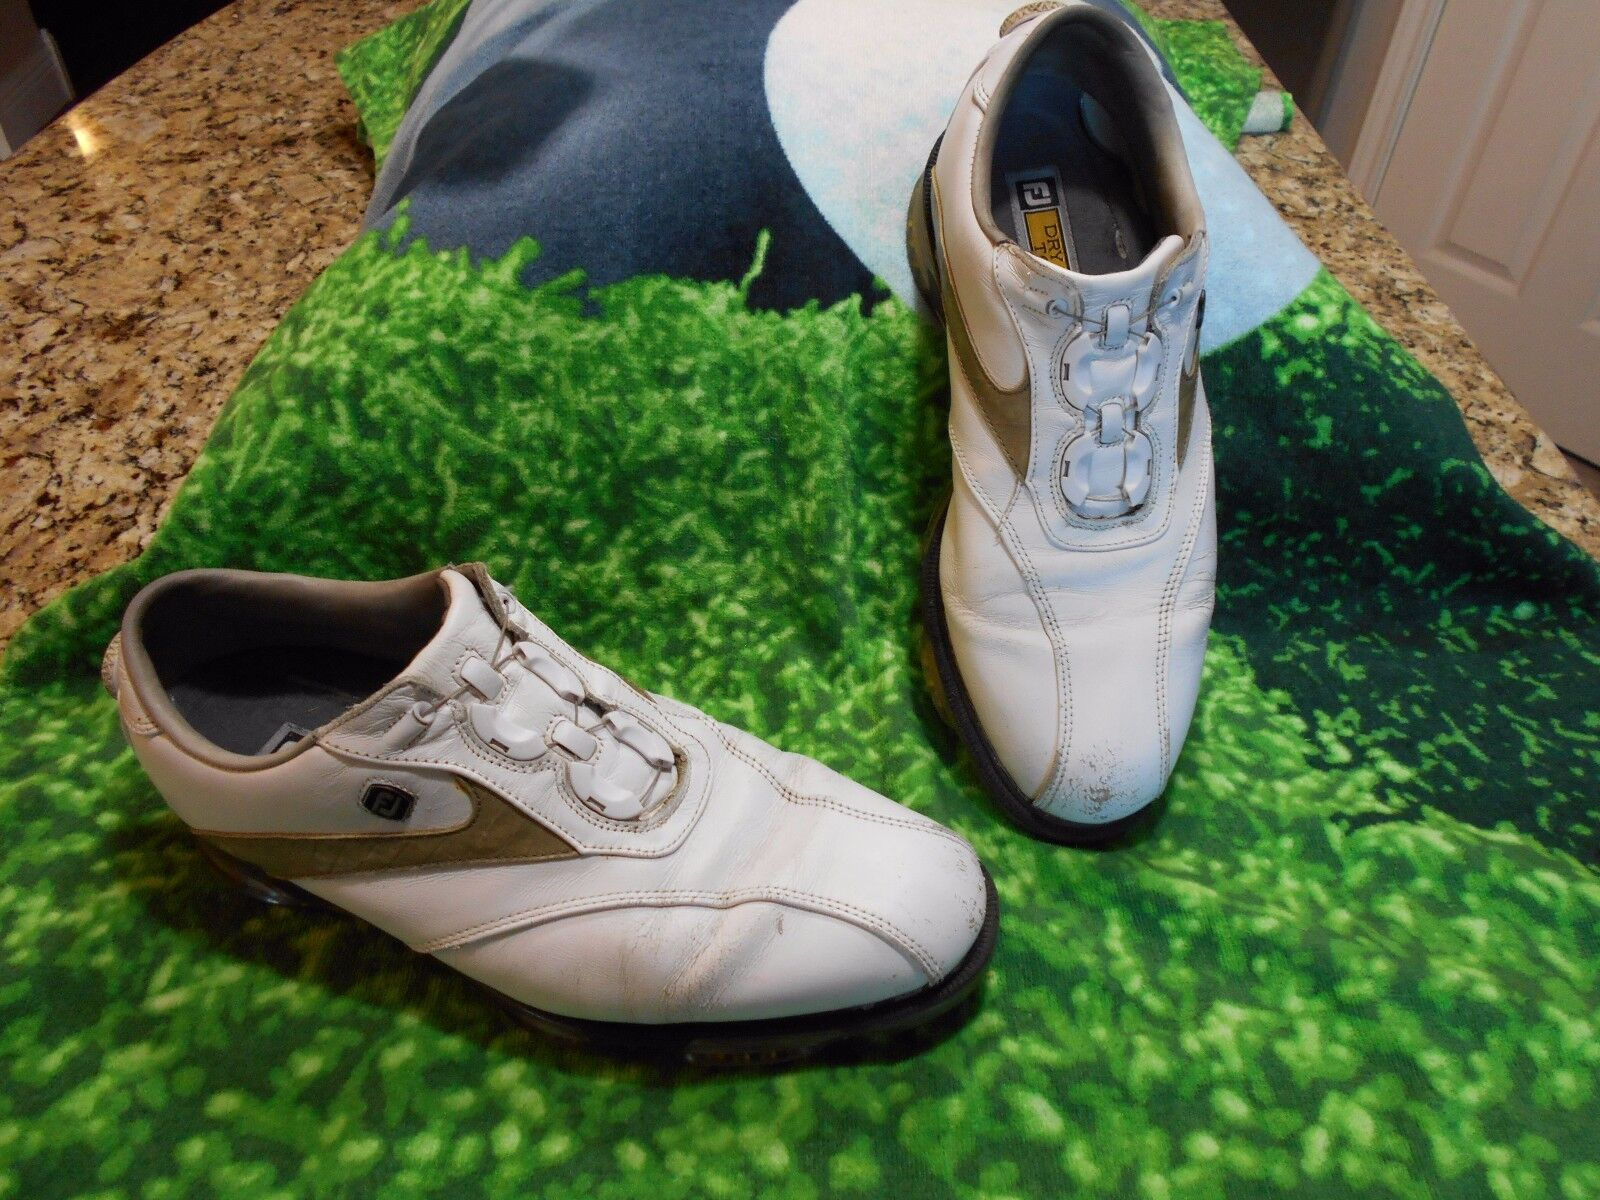 footjoy dryjoys tour scarpe da golf uomini sz 11 m lacing optiflex piattaforma boa lacing m 0644e5